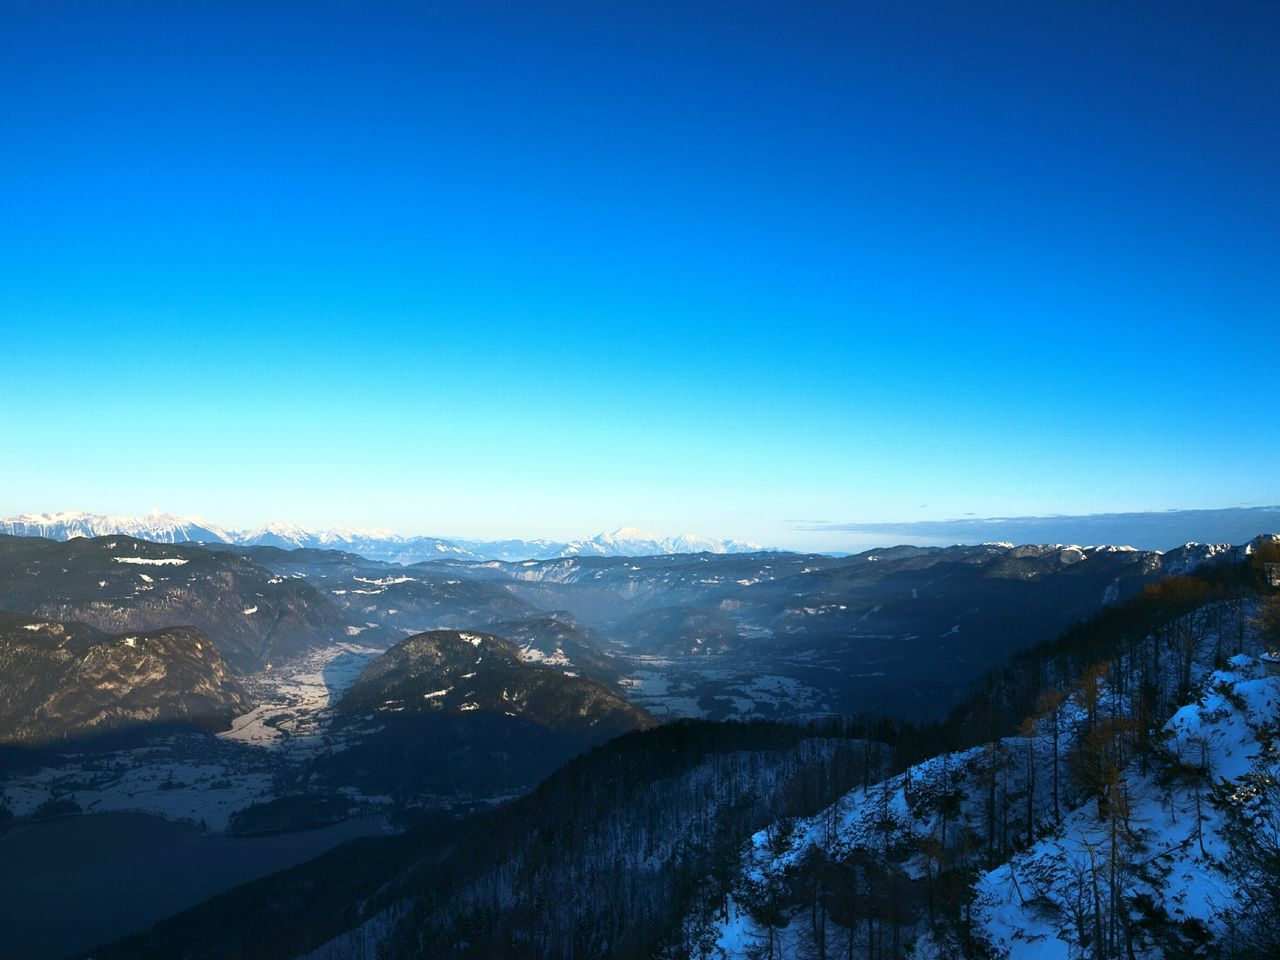 Blue Nature Sky Clear Sky Beauty In Nature Cold Temperature Winter No People Mountain Slovenia Vogel Bohinj, Slovenia